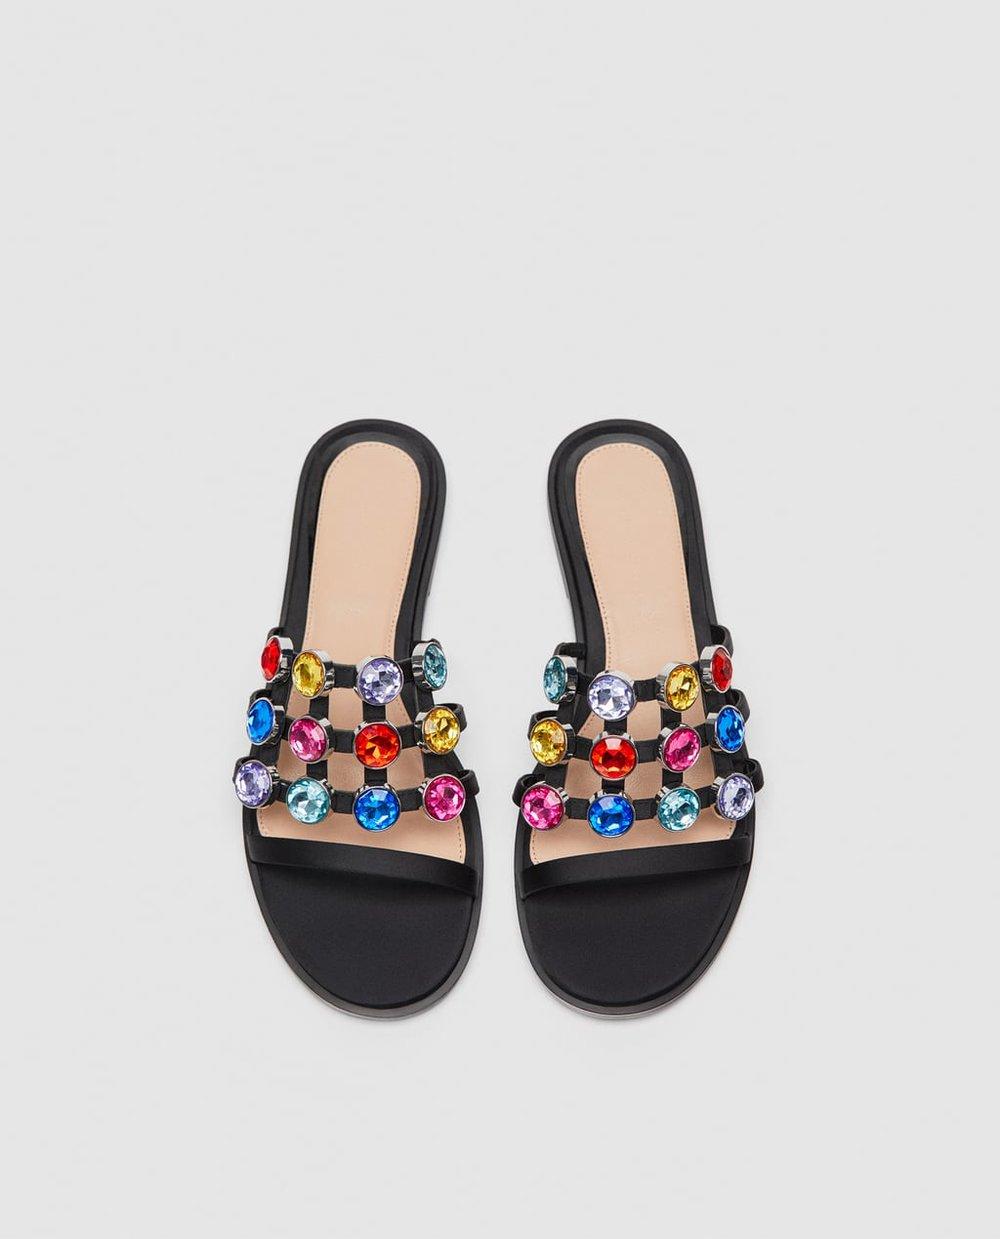 Zara Multicolored Bejeweled Slides